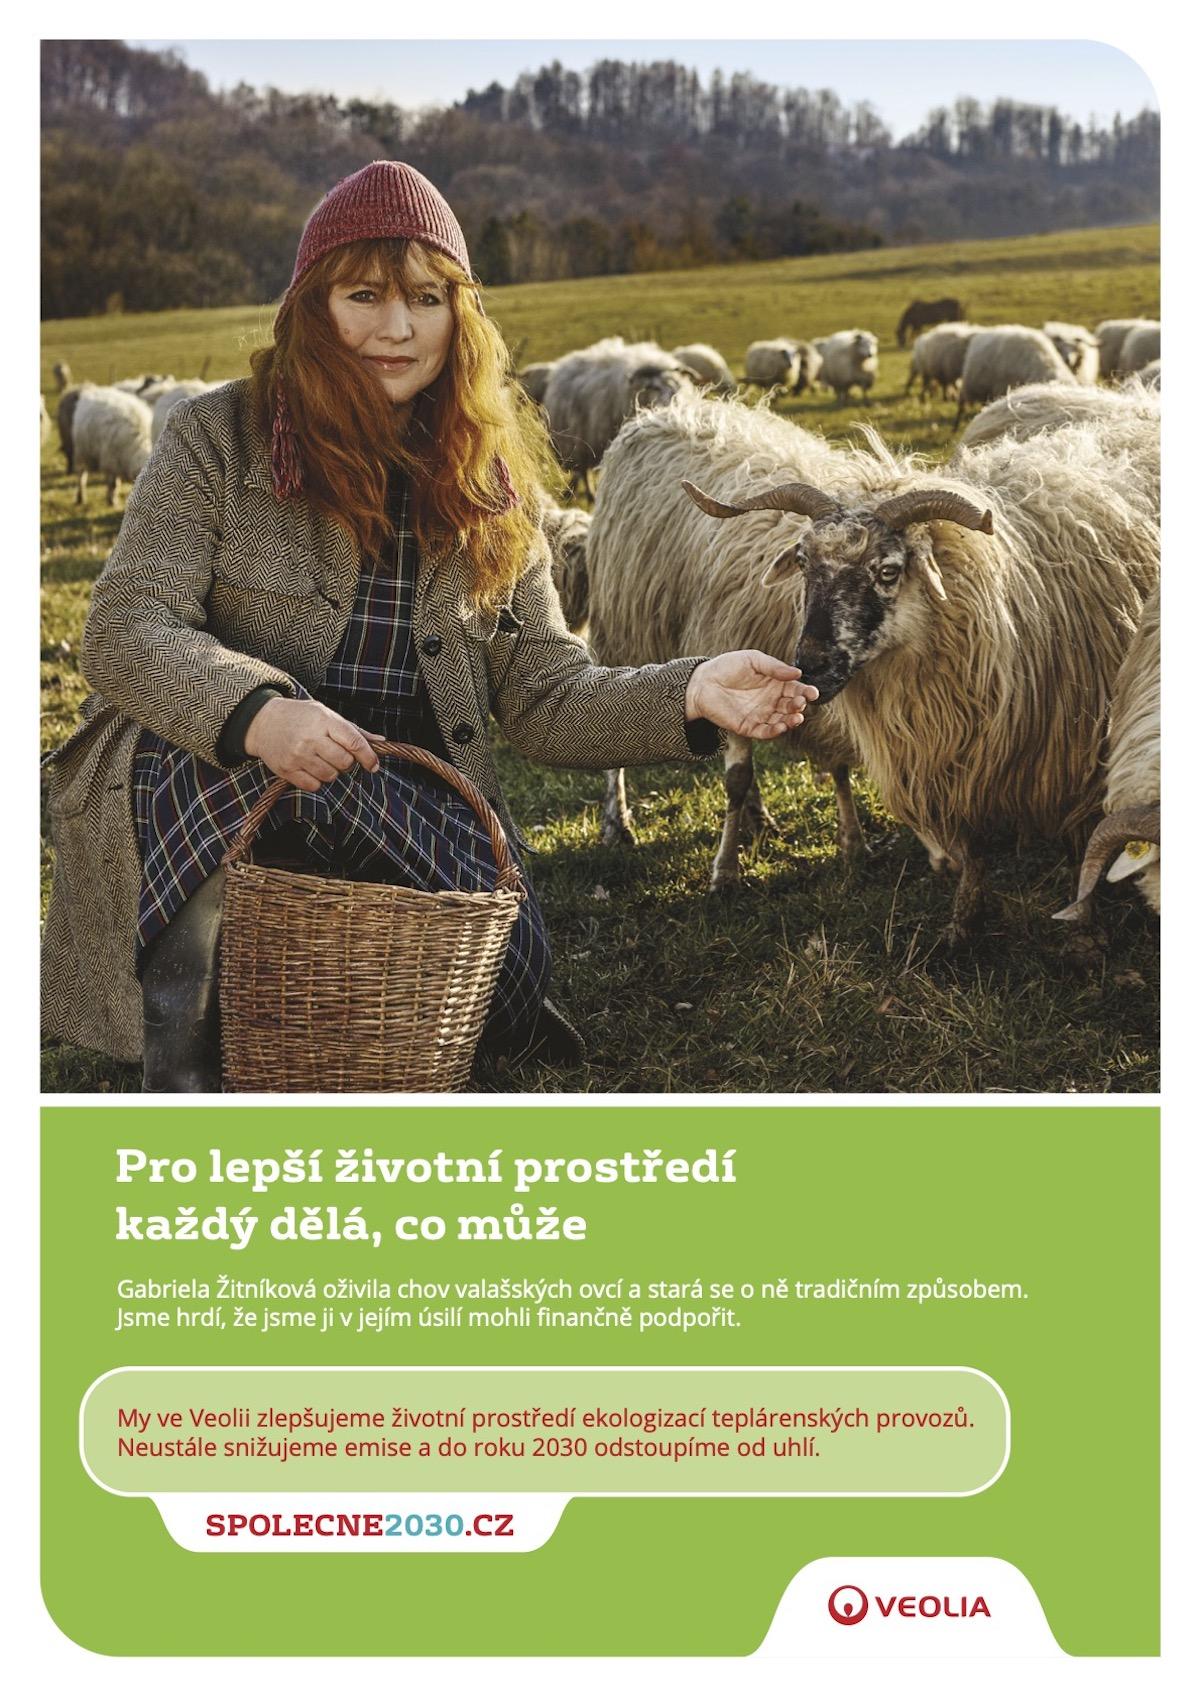 Veolia: Ovce (Lucky U)